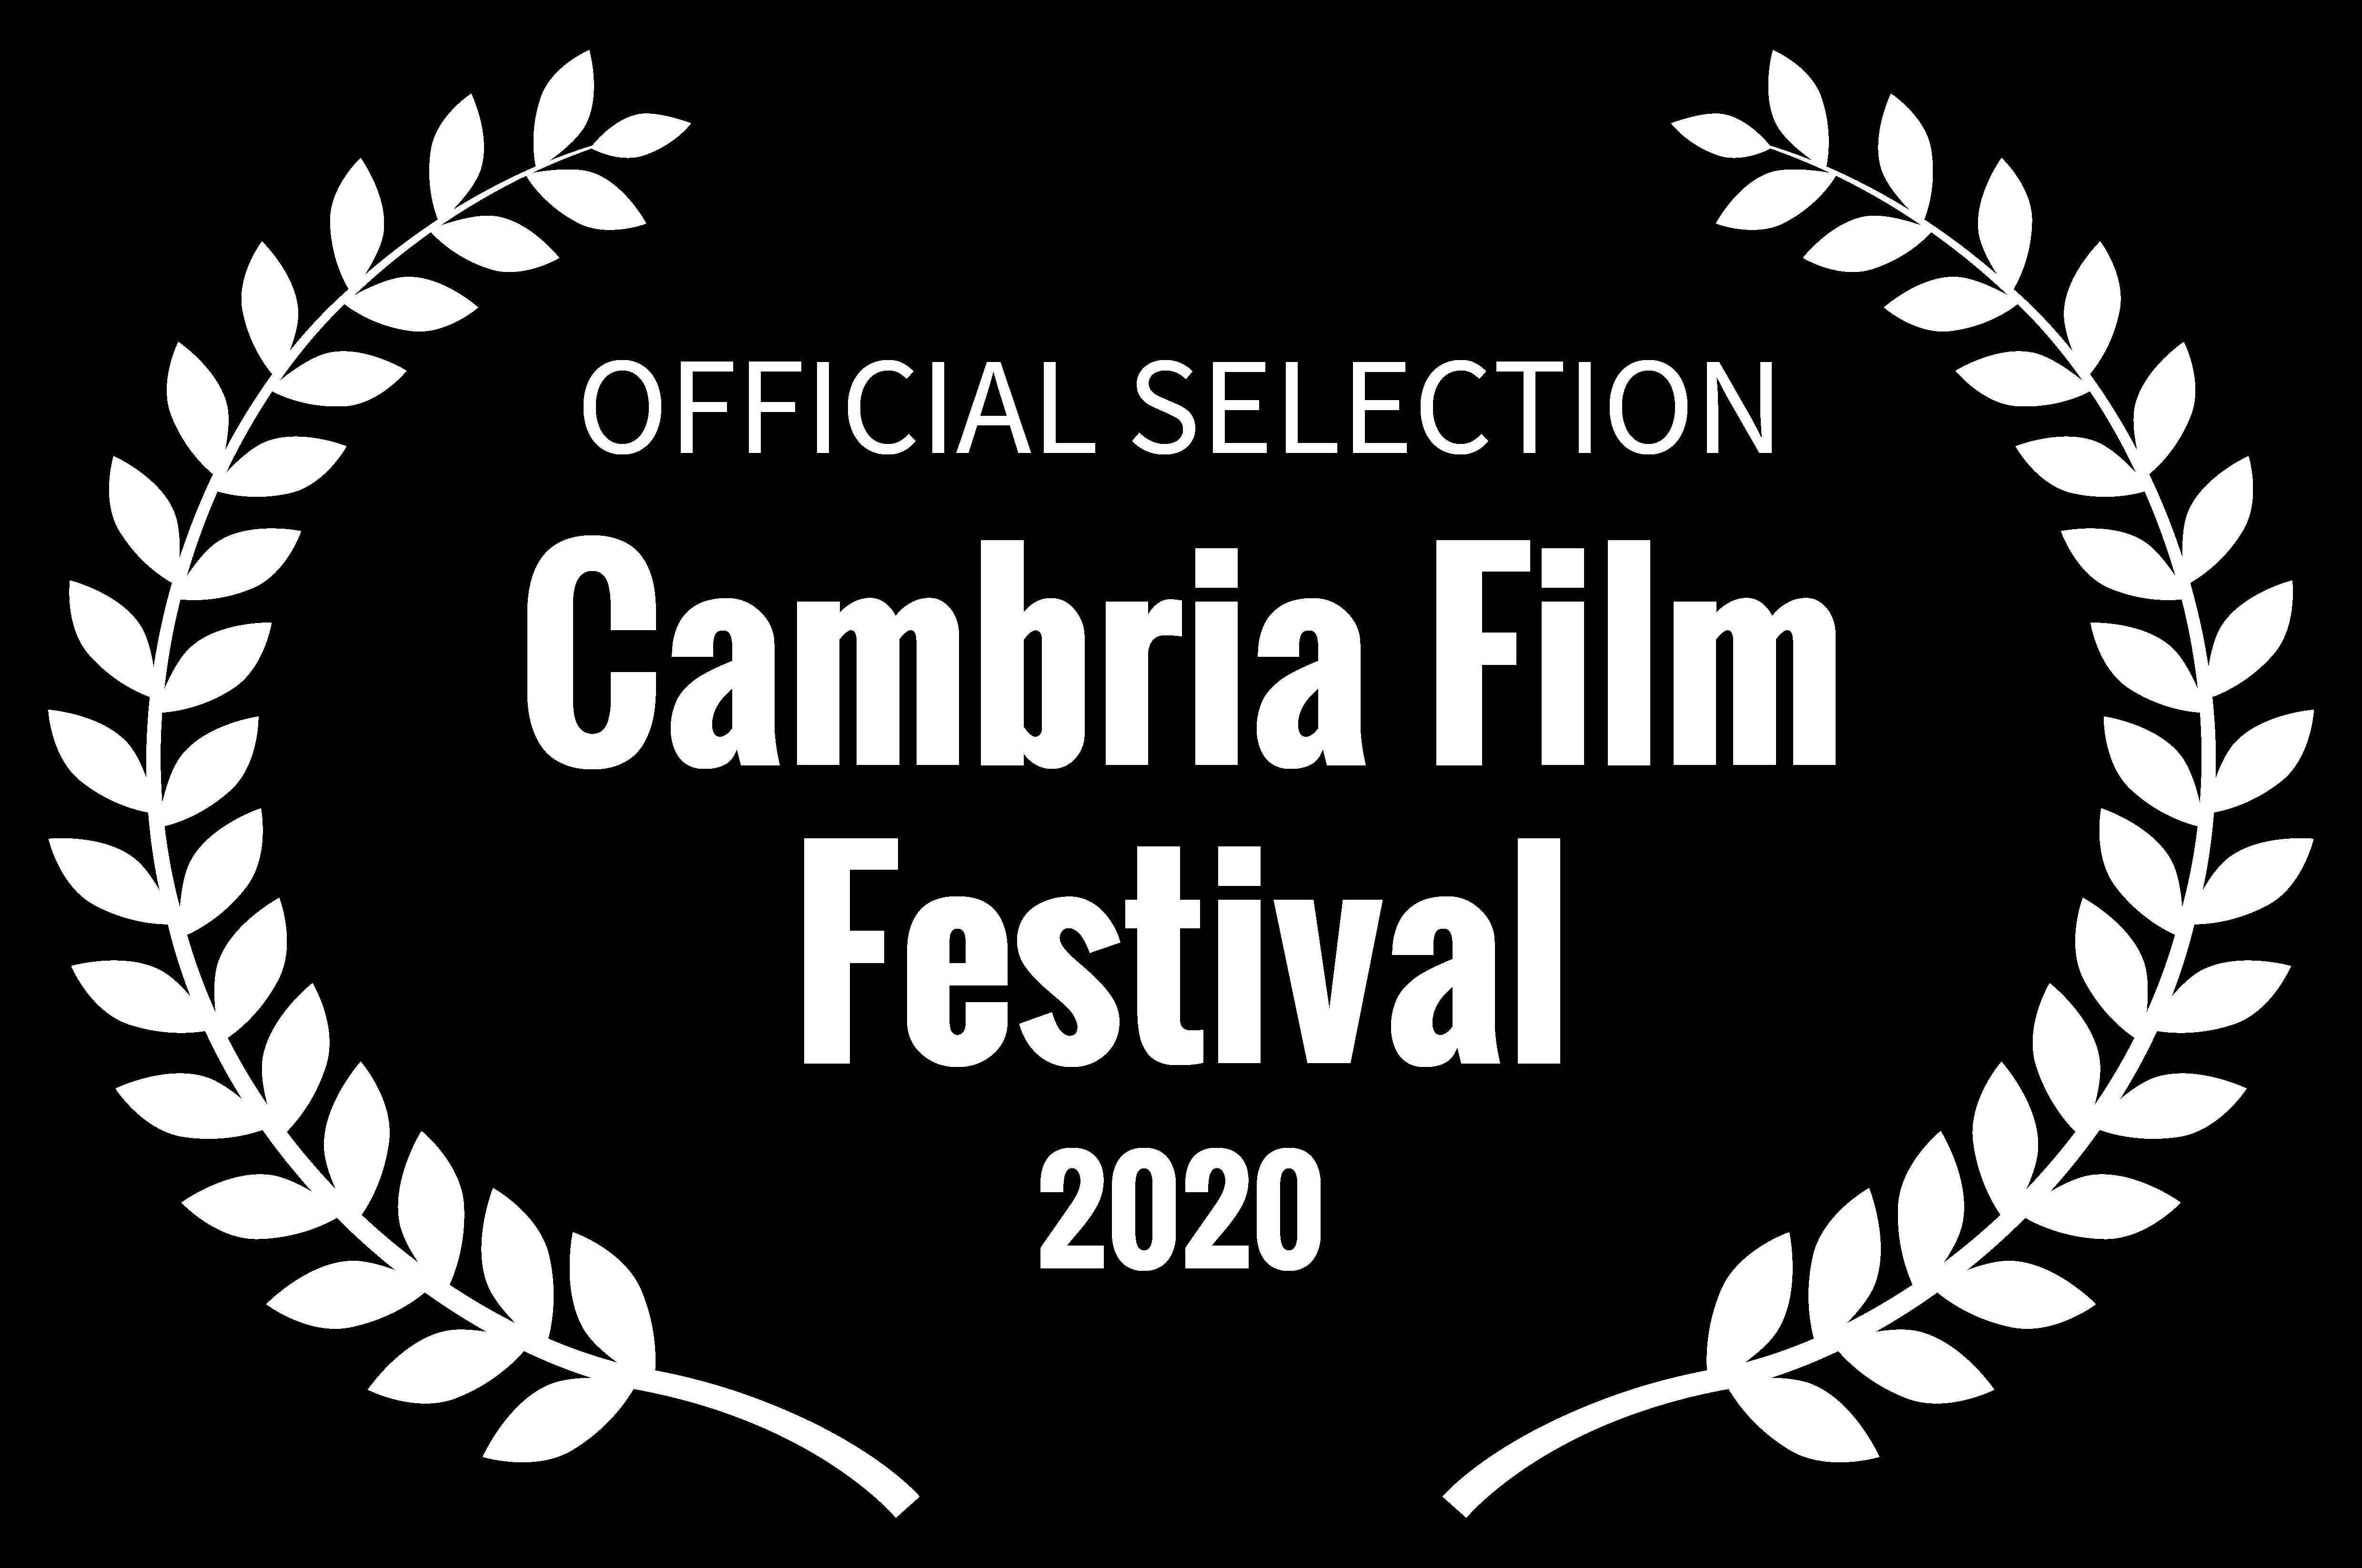 OFFICIALSELECTION-CambriaFilmFestival-20